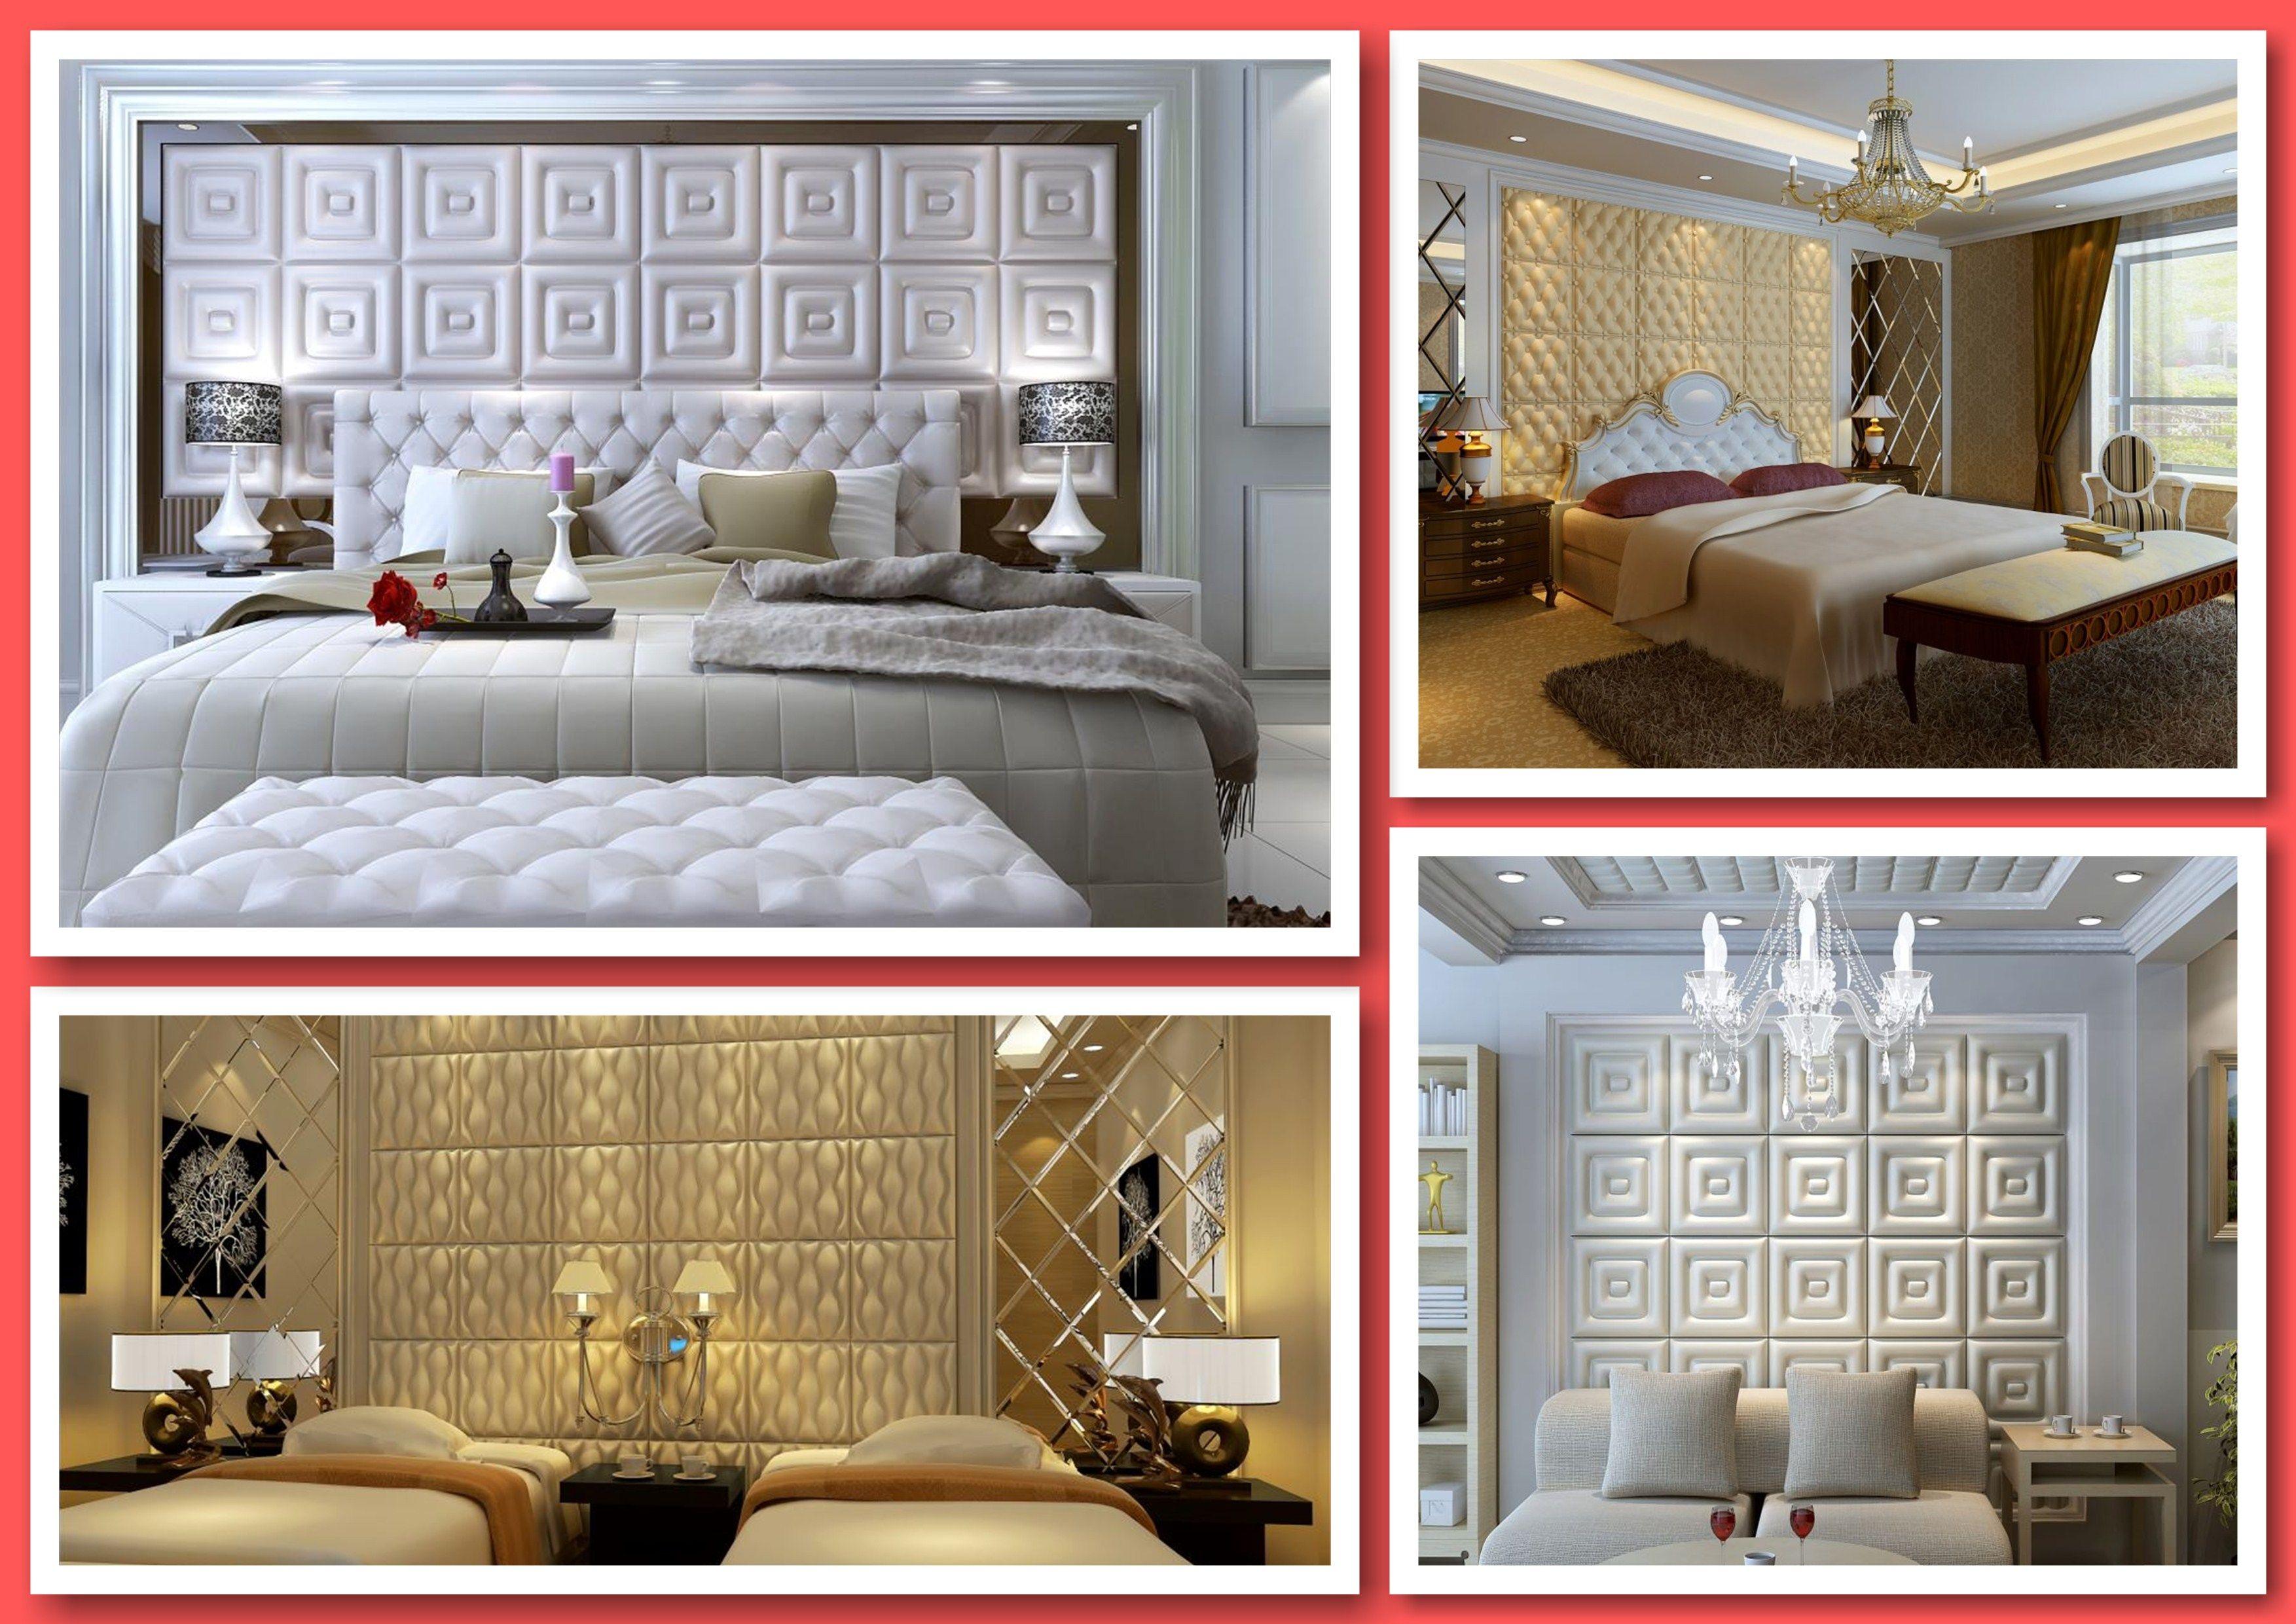 Faux Leather Tile Bedroom Accent Walls | Ceiling Tile ...